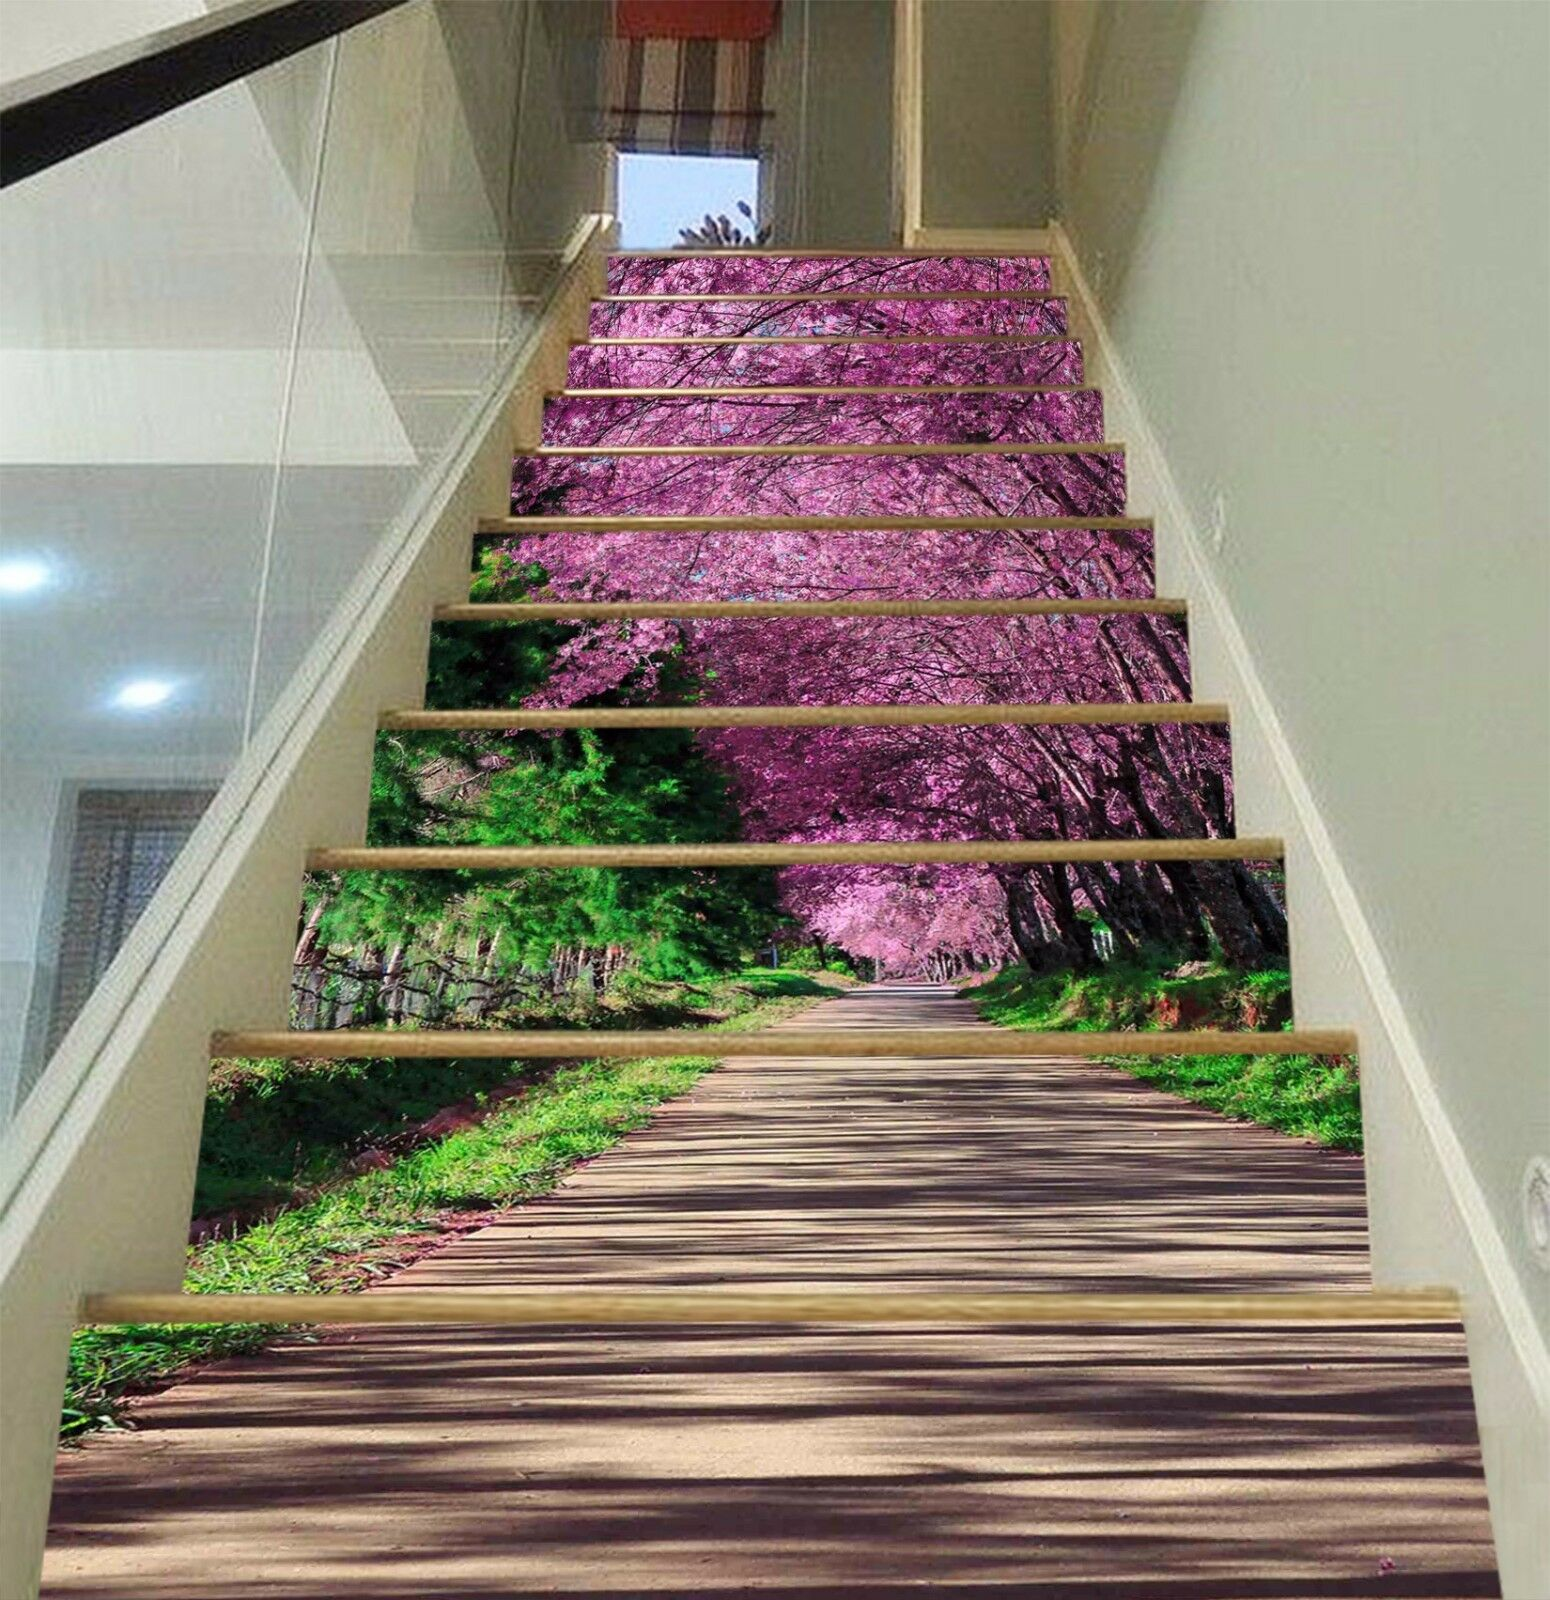 3D Road Flower Tree Stair Risers Decoration Photo Mural Vinyl Decal Wallpaper AU